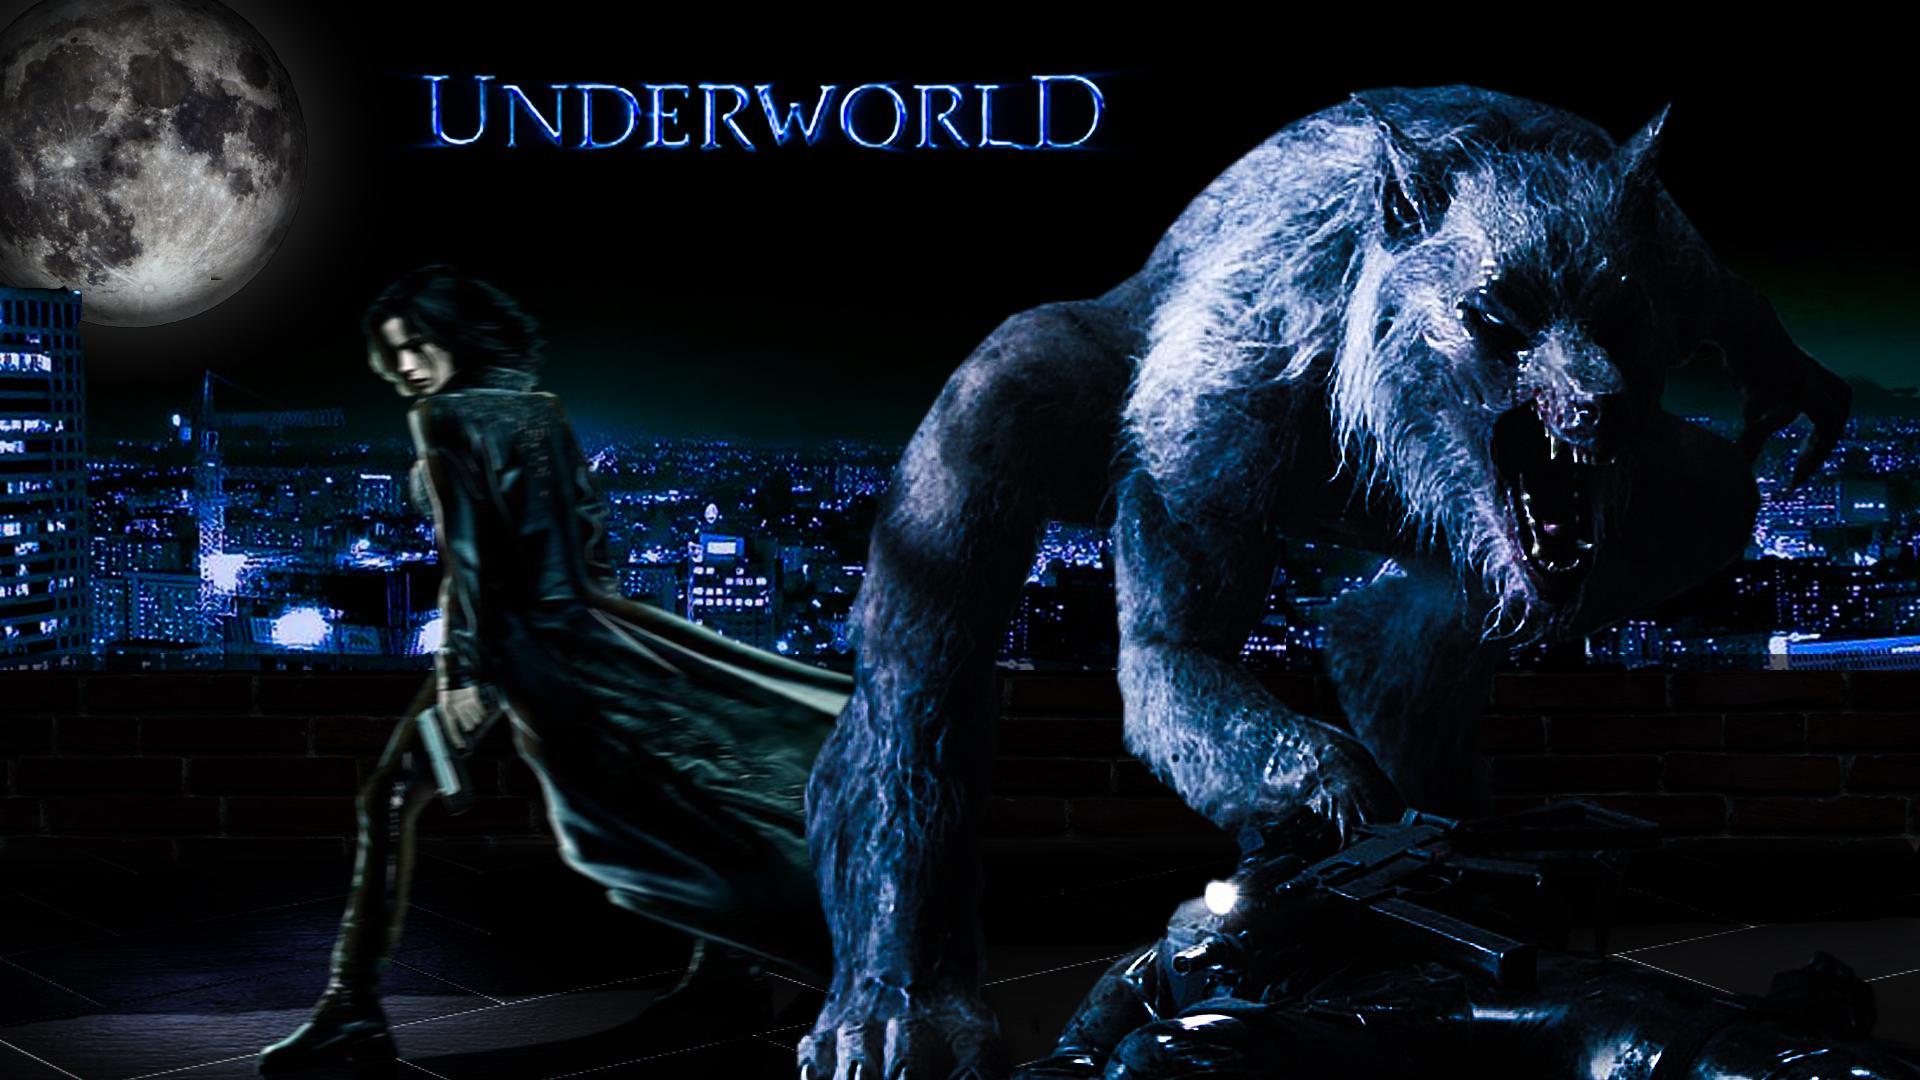 Underworld Wallpaper by Crylex 1920x1080